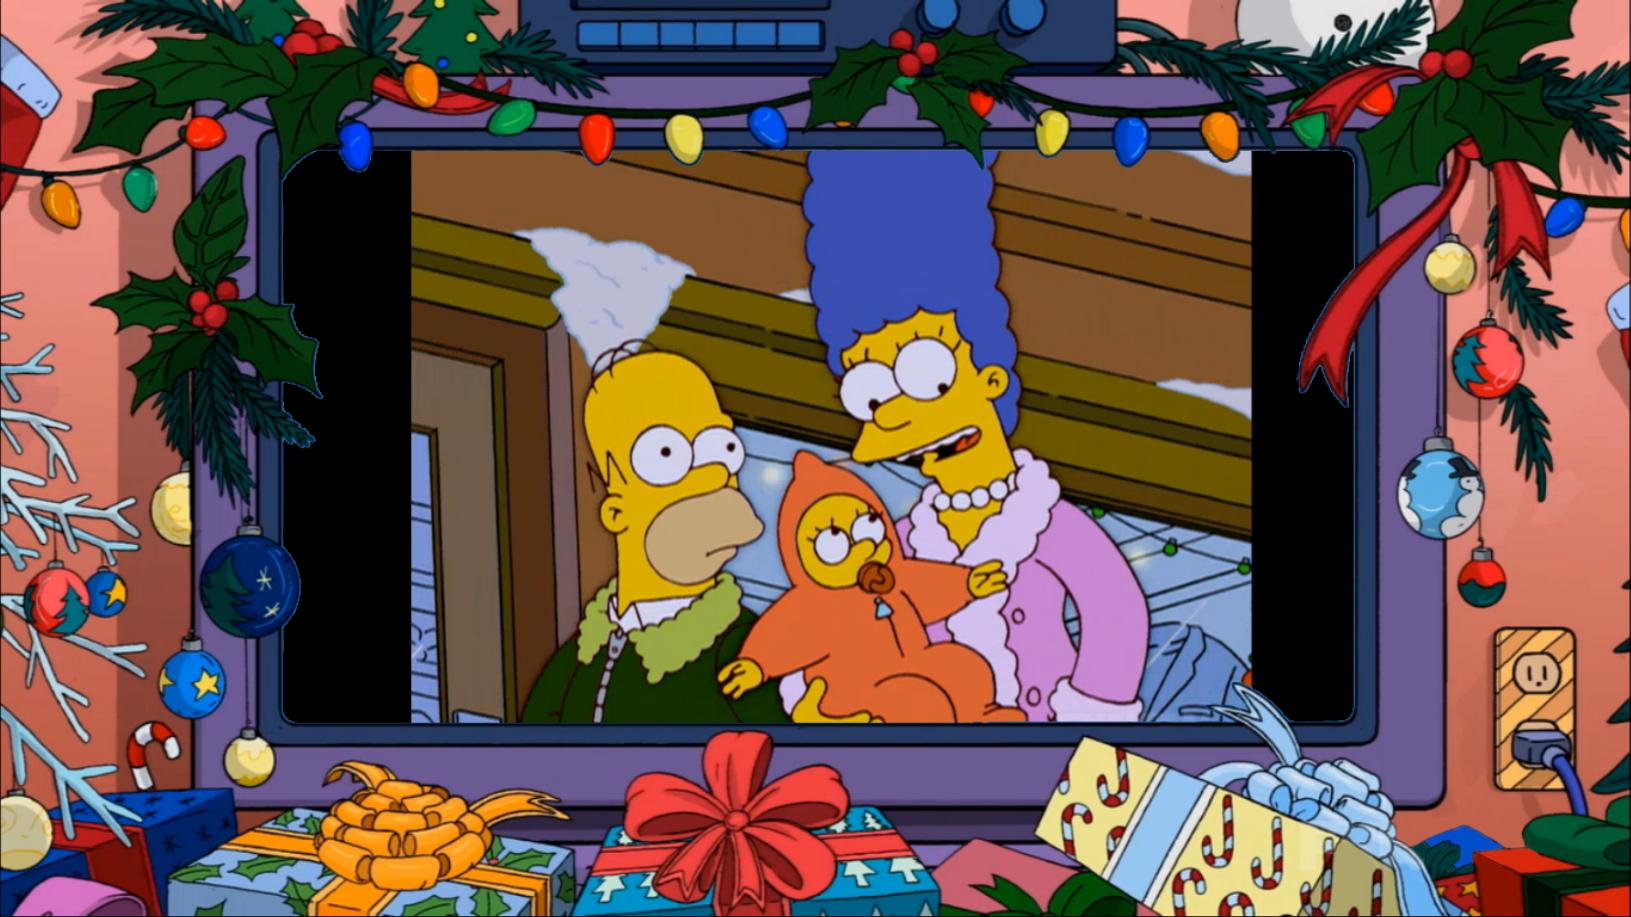 Simpsons Christmas Decor